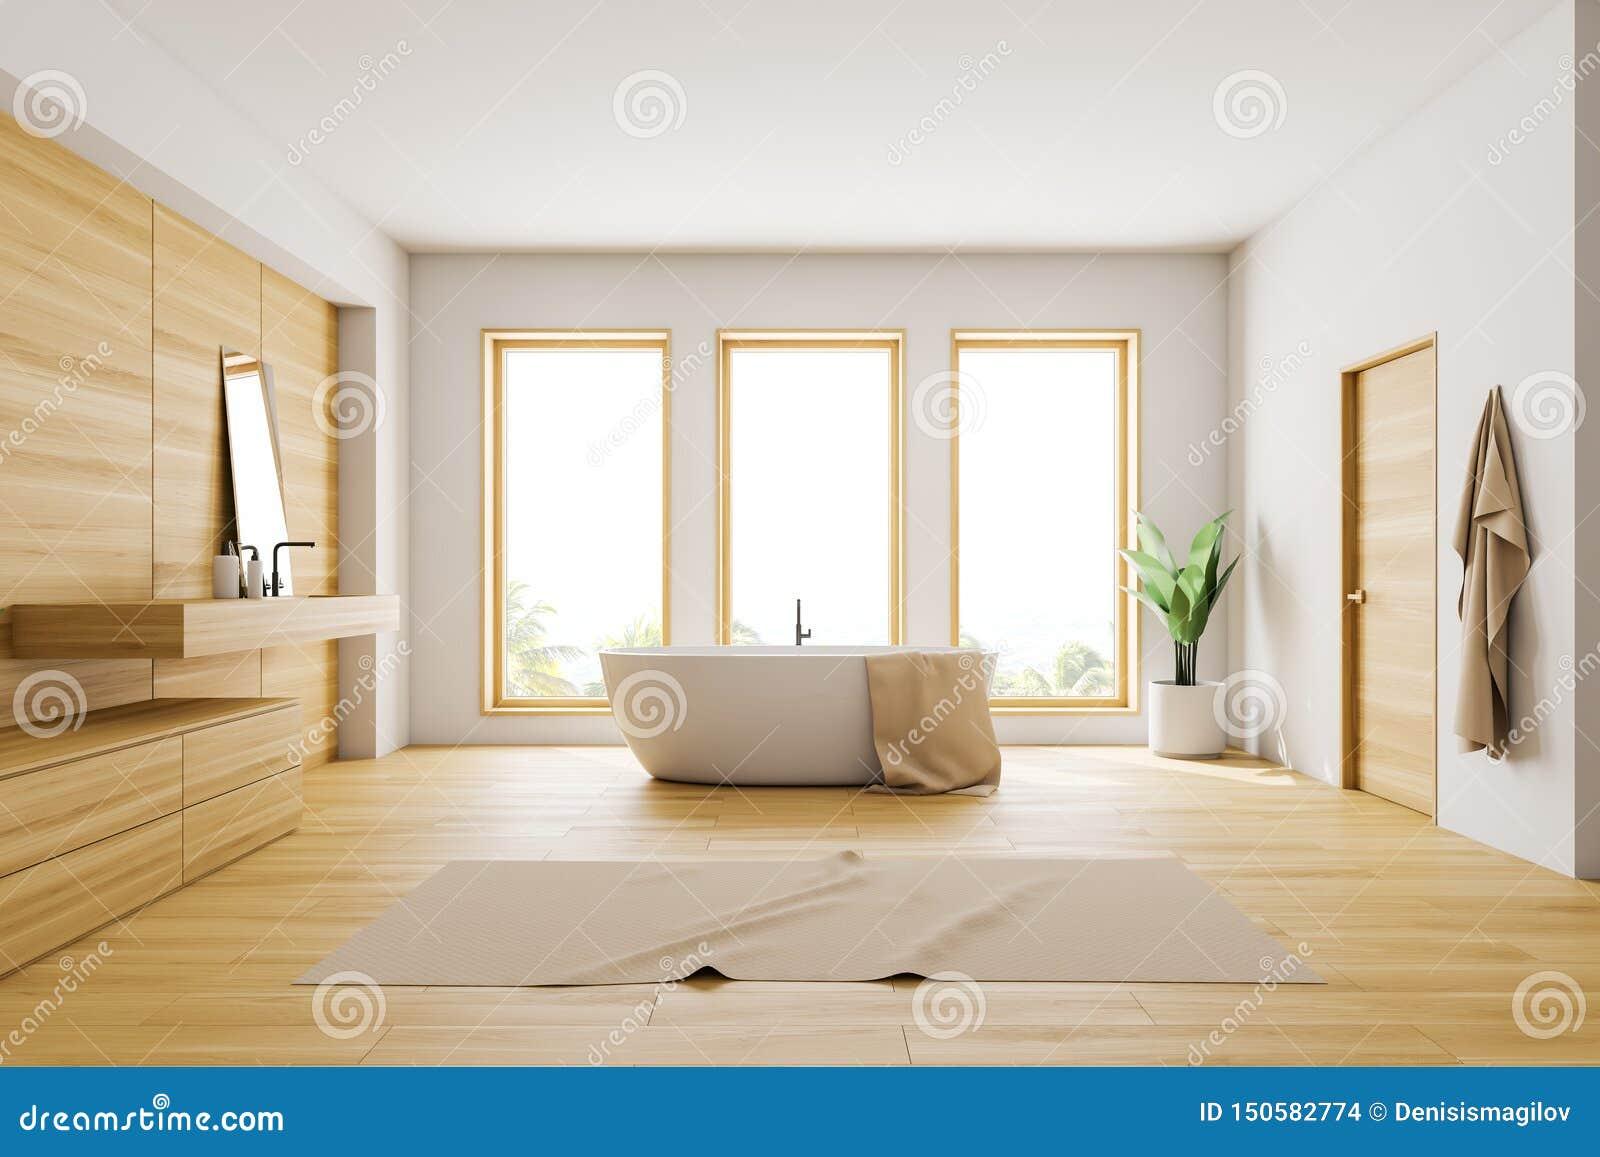 White And Wooden Loft Bathroom Interior Stock Illustration